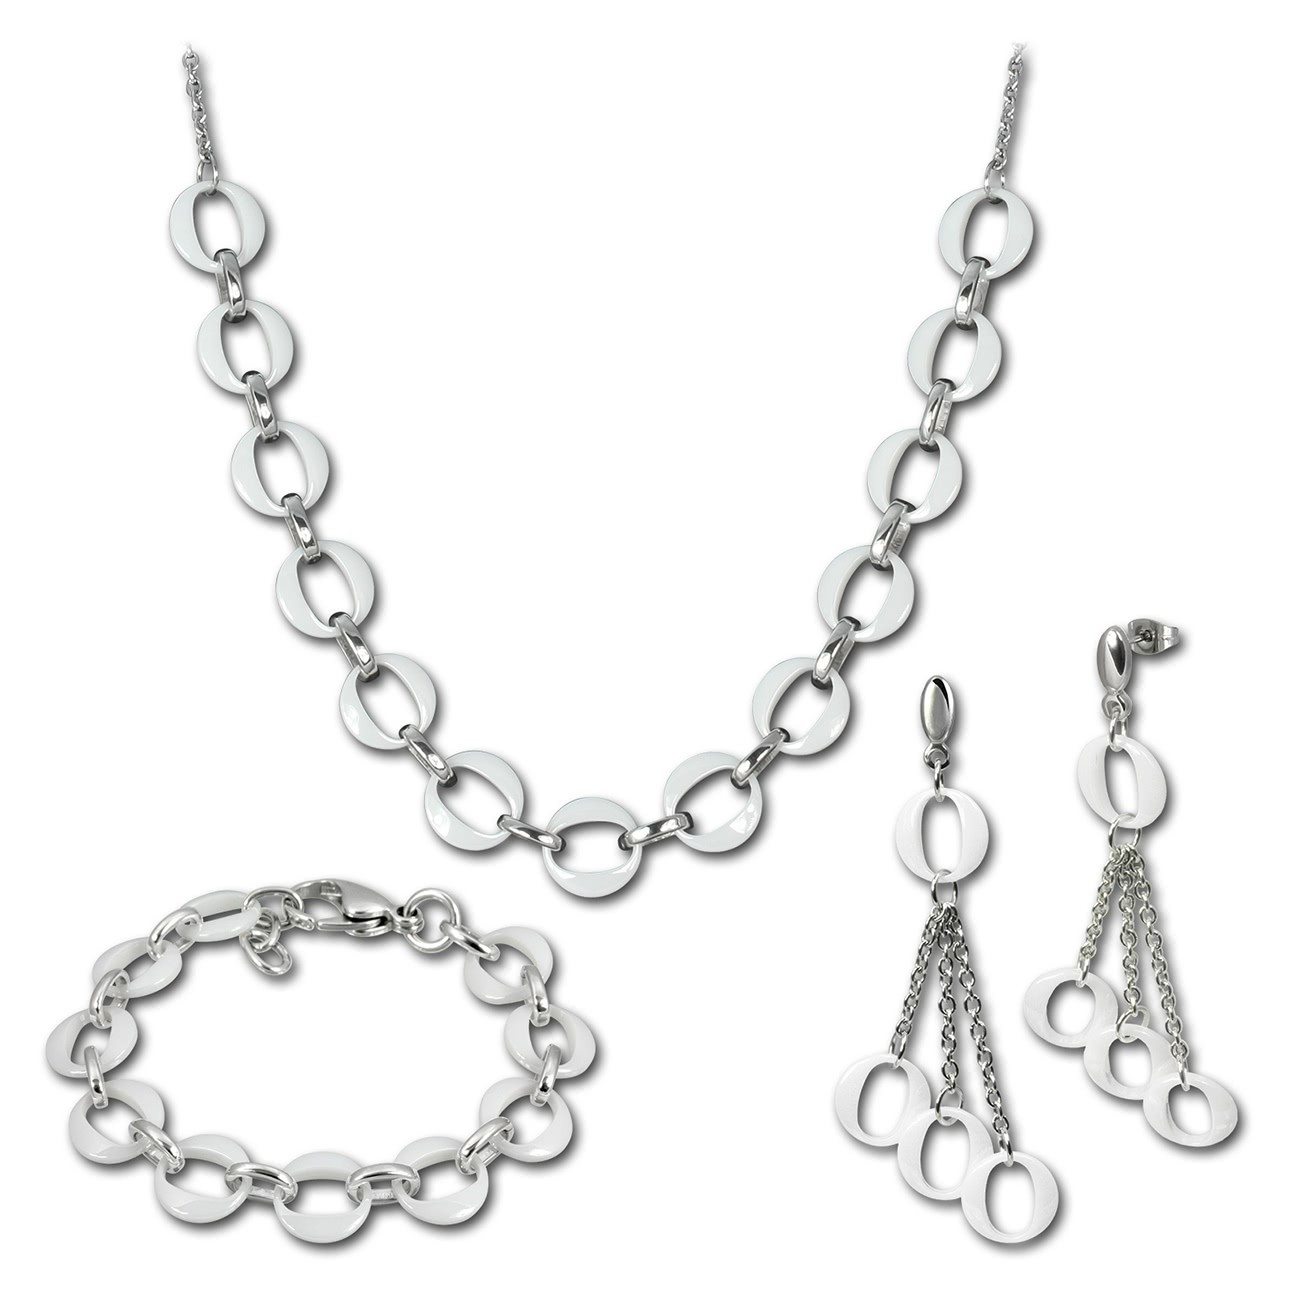 Amello Edelstahlschmuckset Keramik Kette, Armband, Ohrring ESSX02W